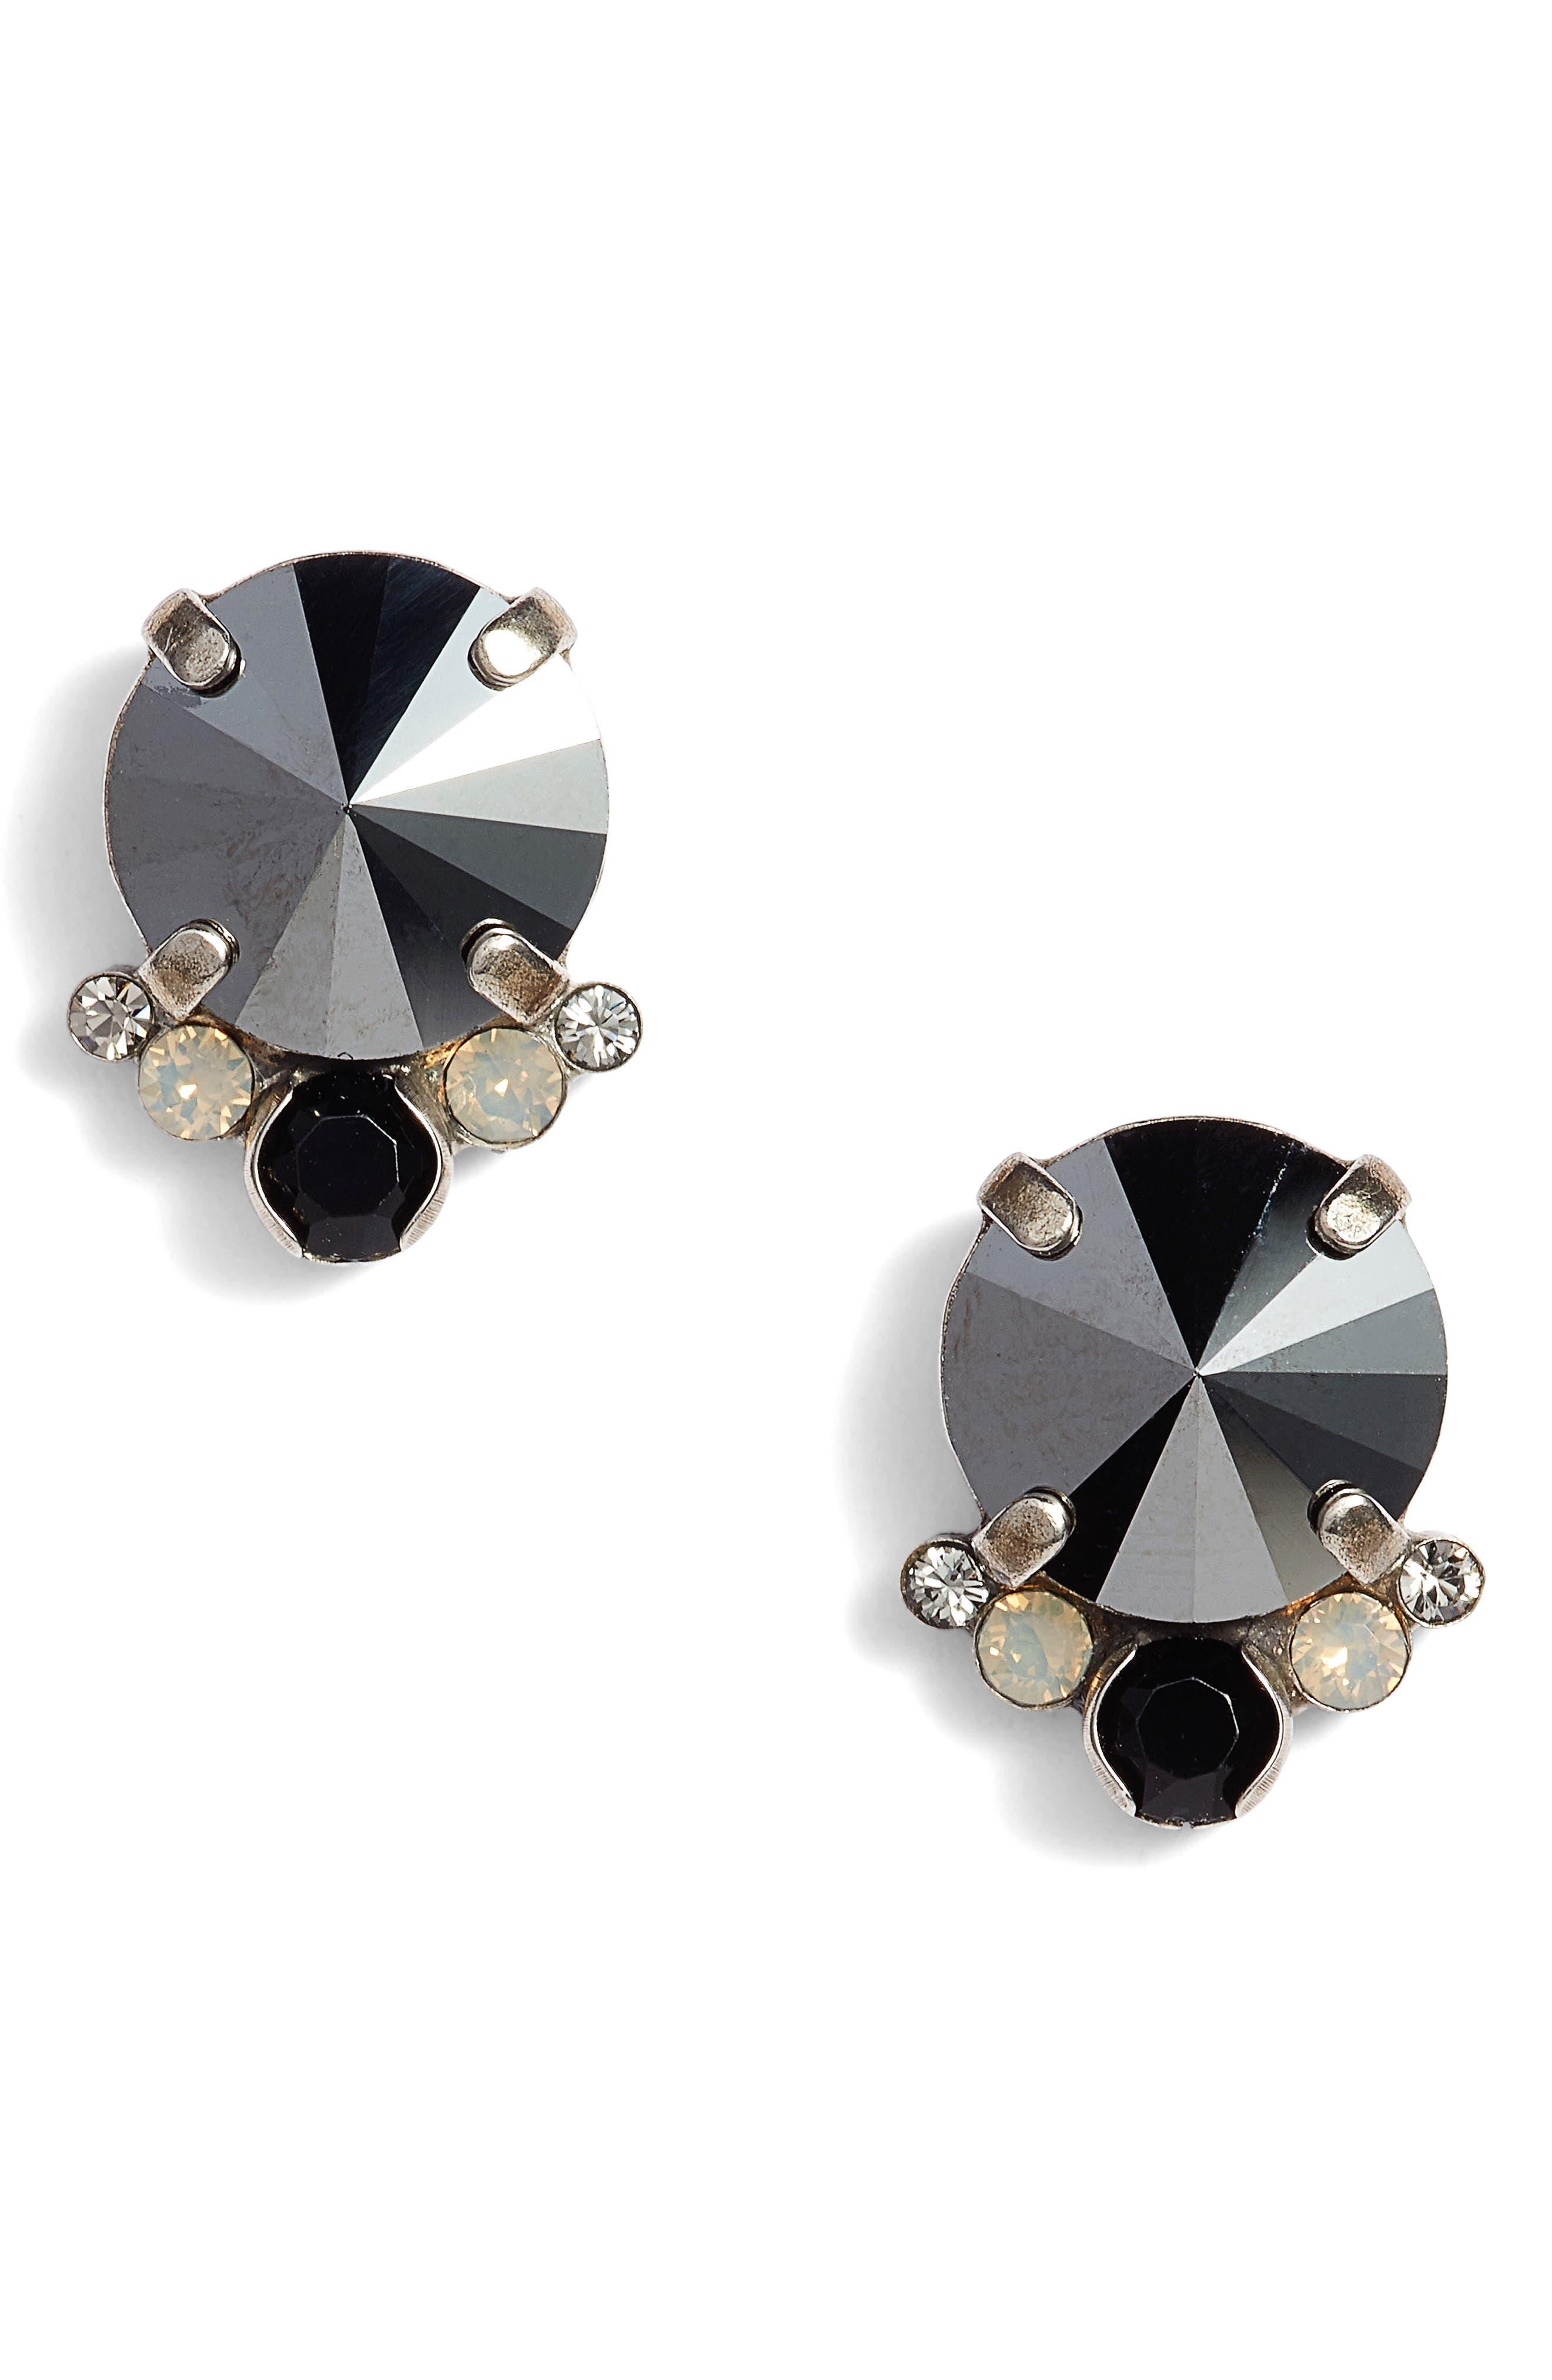 Regal Crystal Stud Earrings,                             Main thumbnail 1, color,                             Black